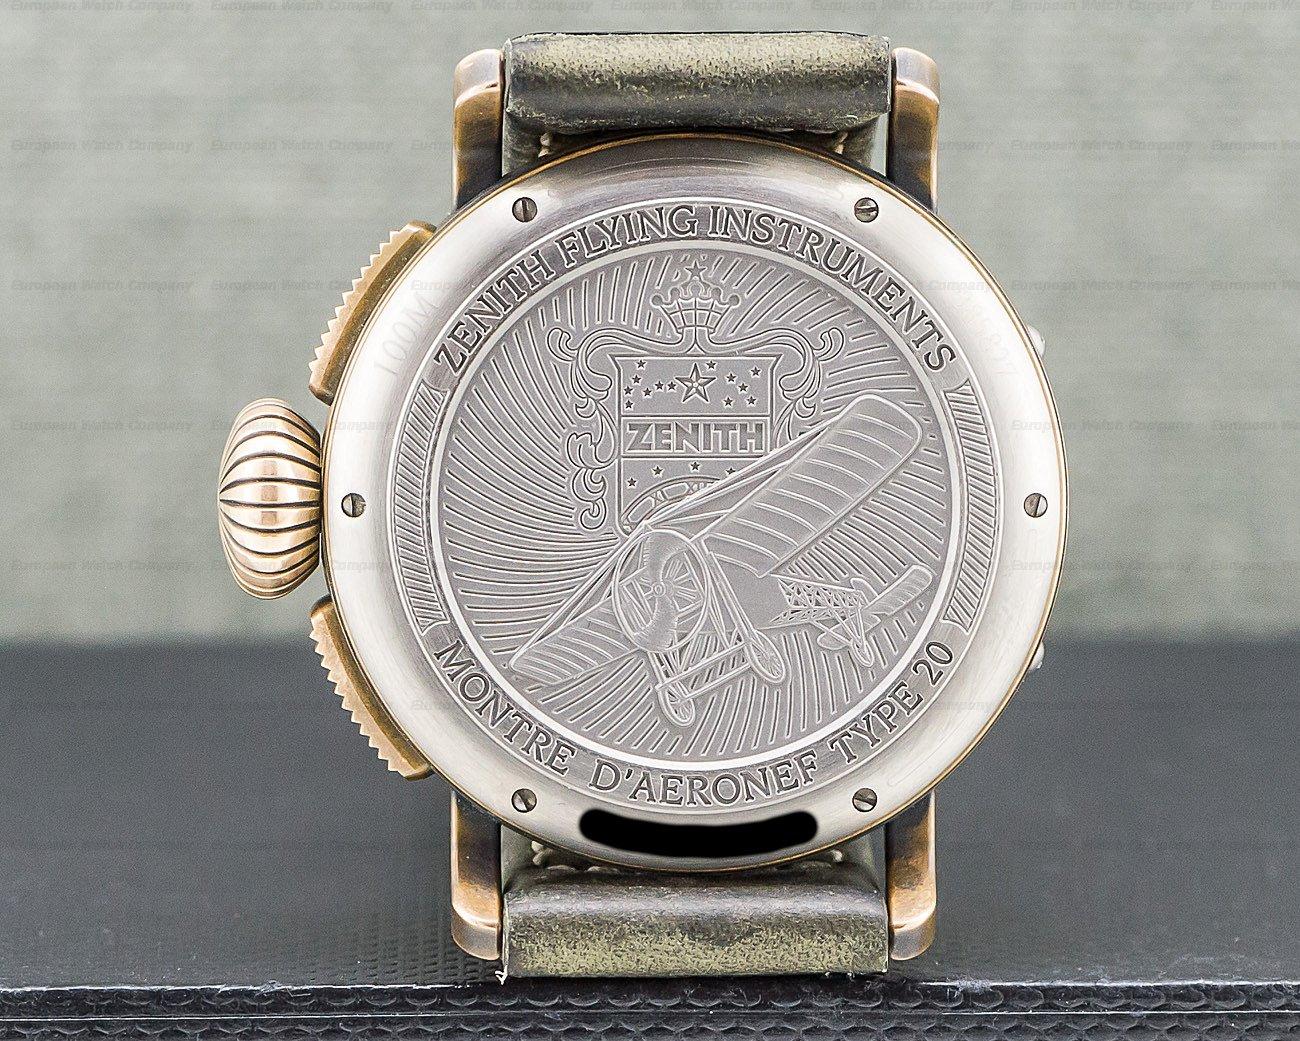 Zenith 29.2430.4069/21.C800 Heritage Pilot Type 20 Chronograph SS